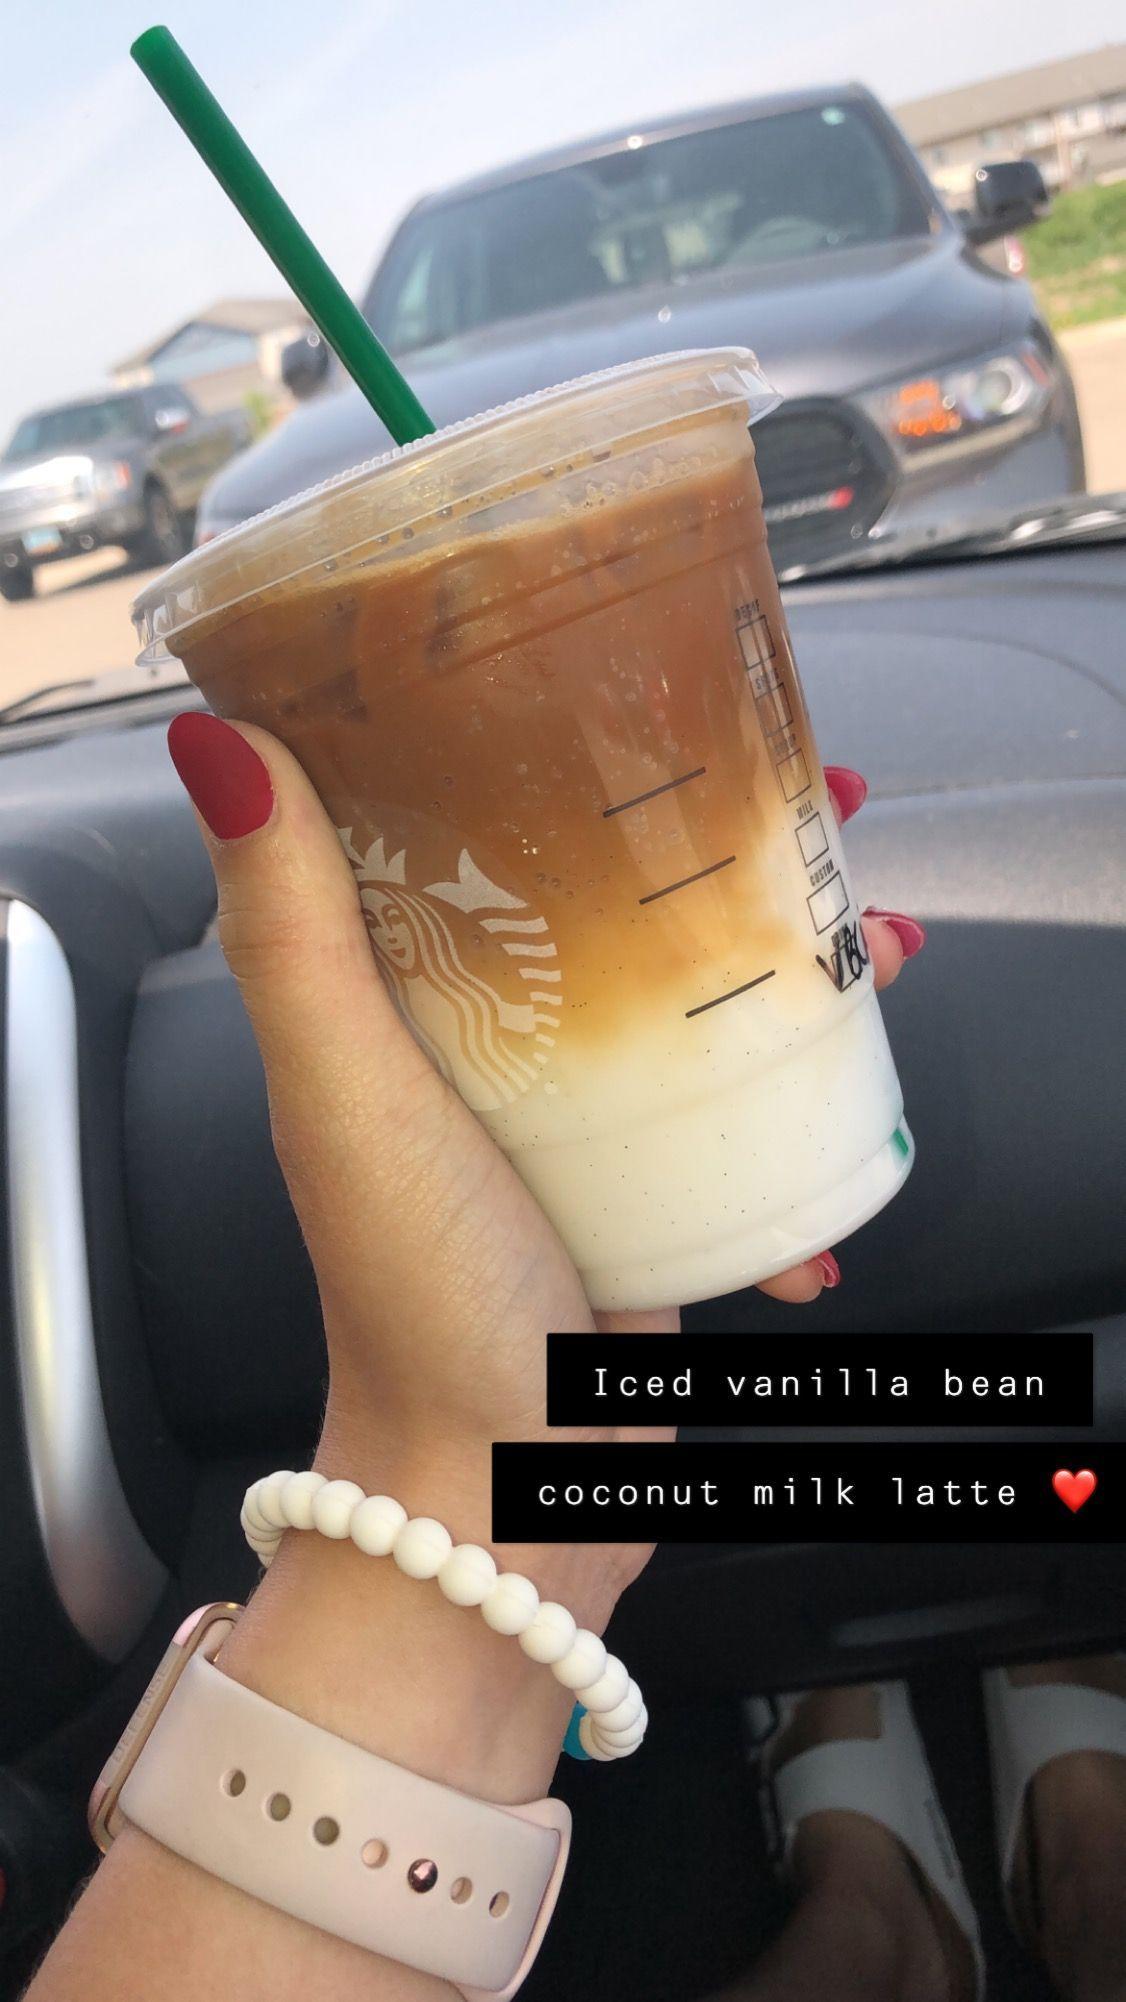 Photo of Starbucks drink